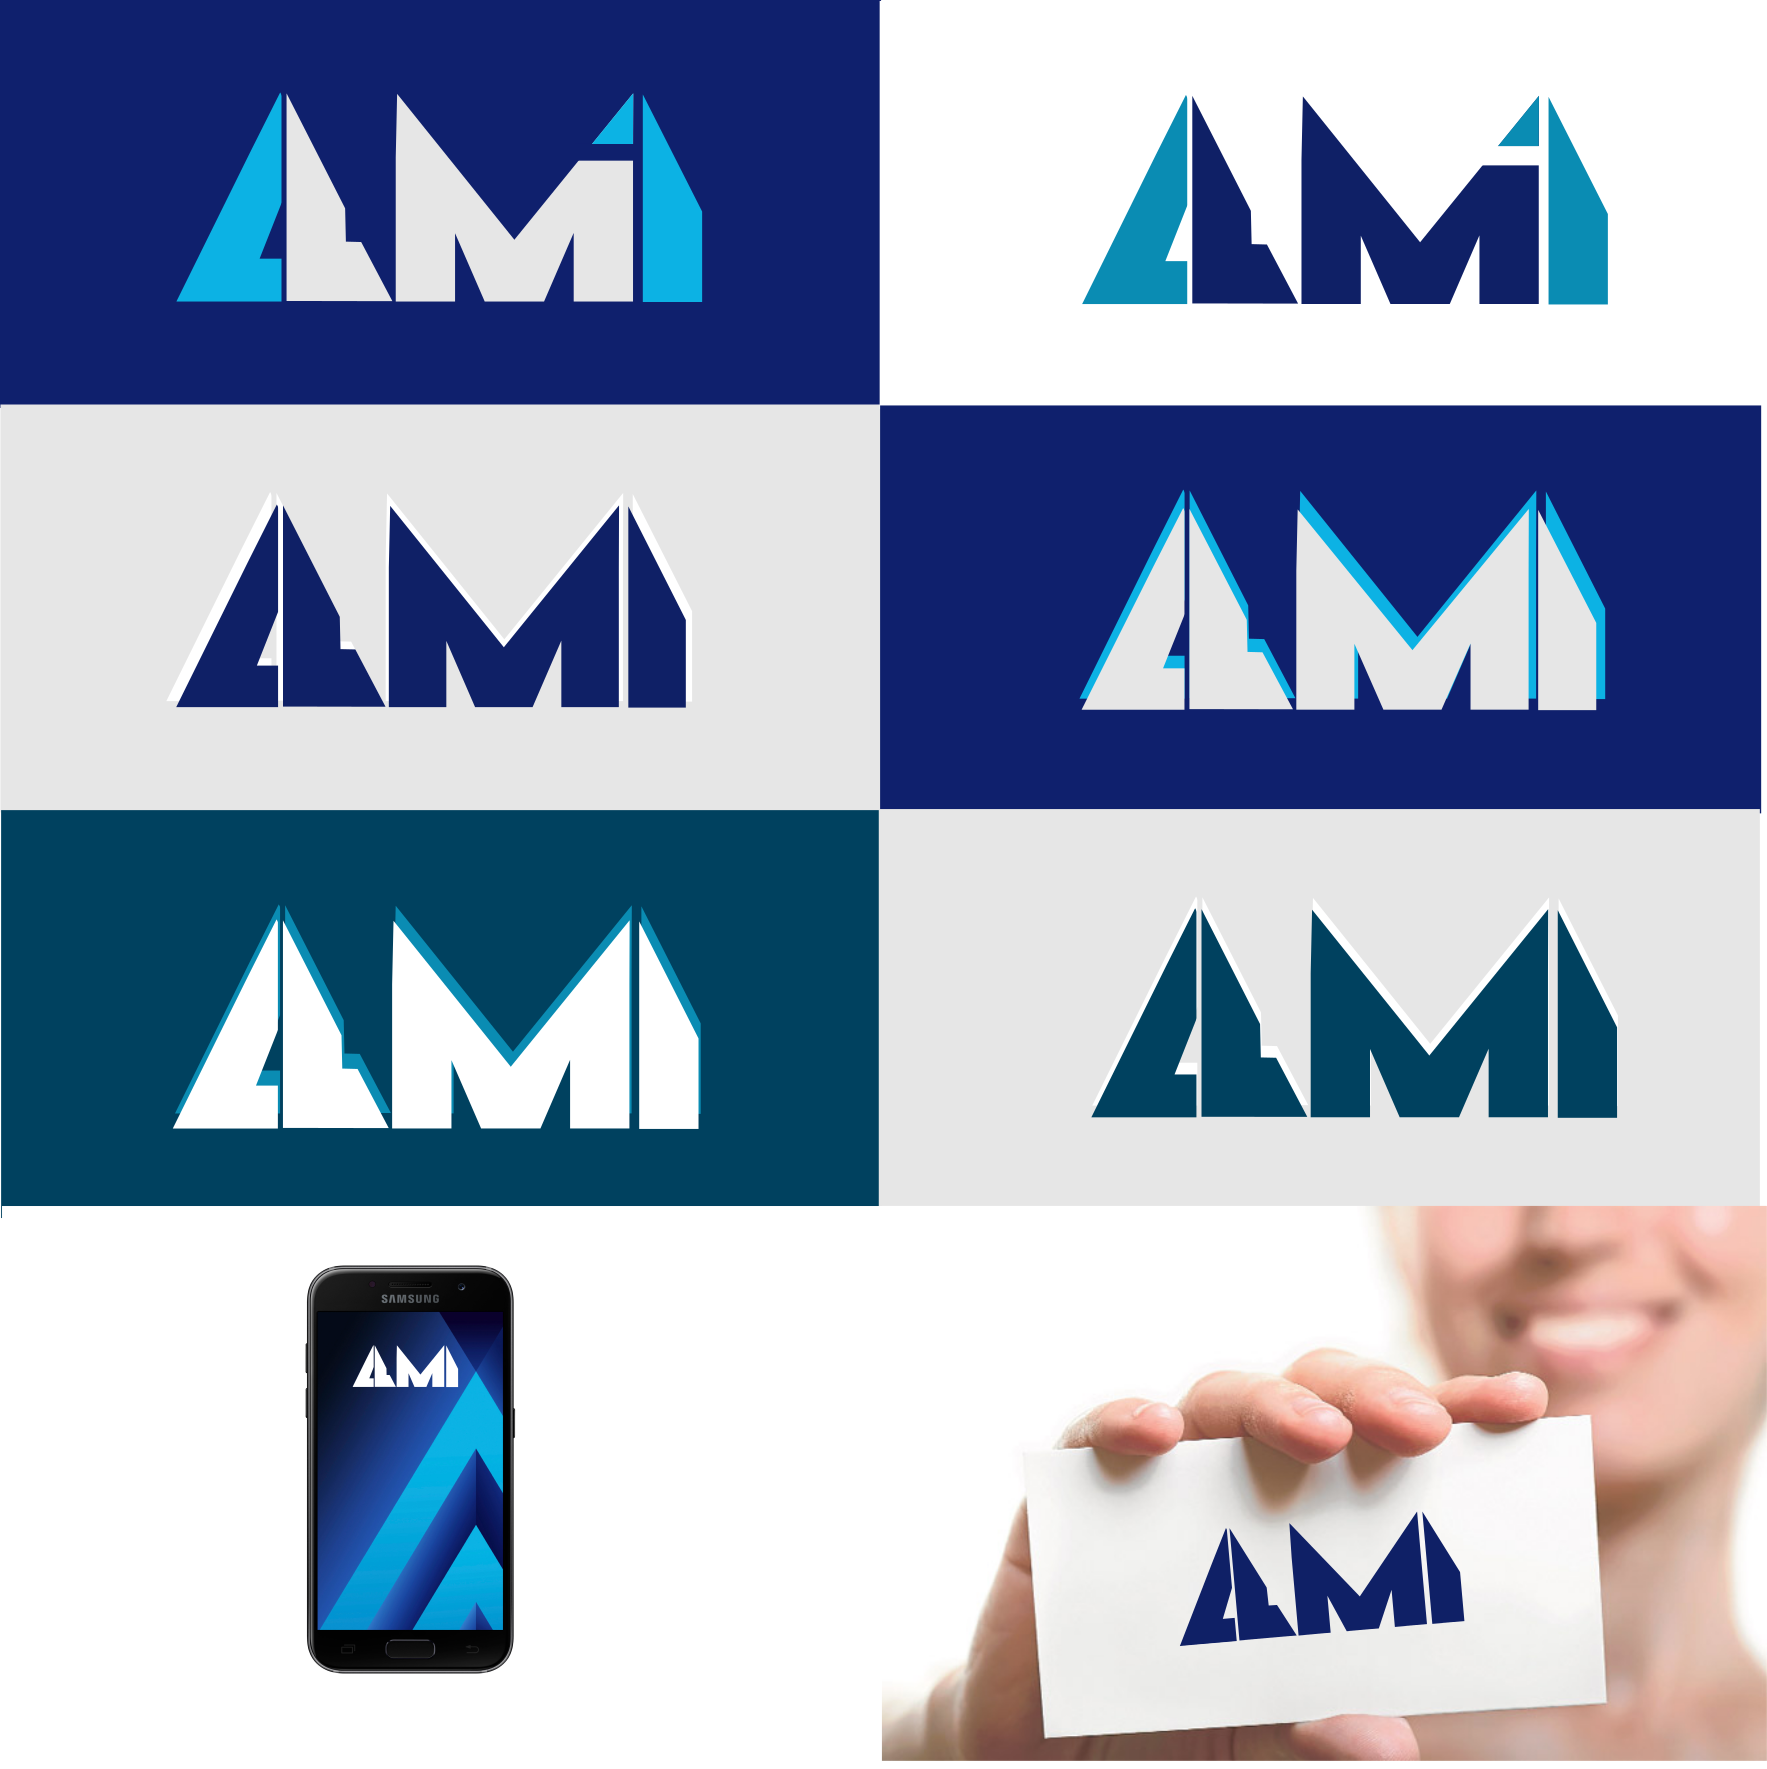 Разработка логотипа и фона фото f_115598be8ade51e7.png